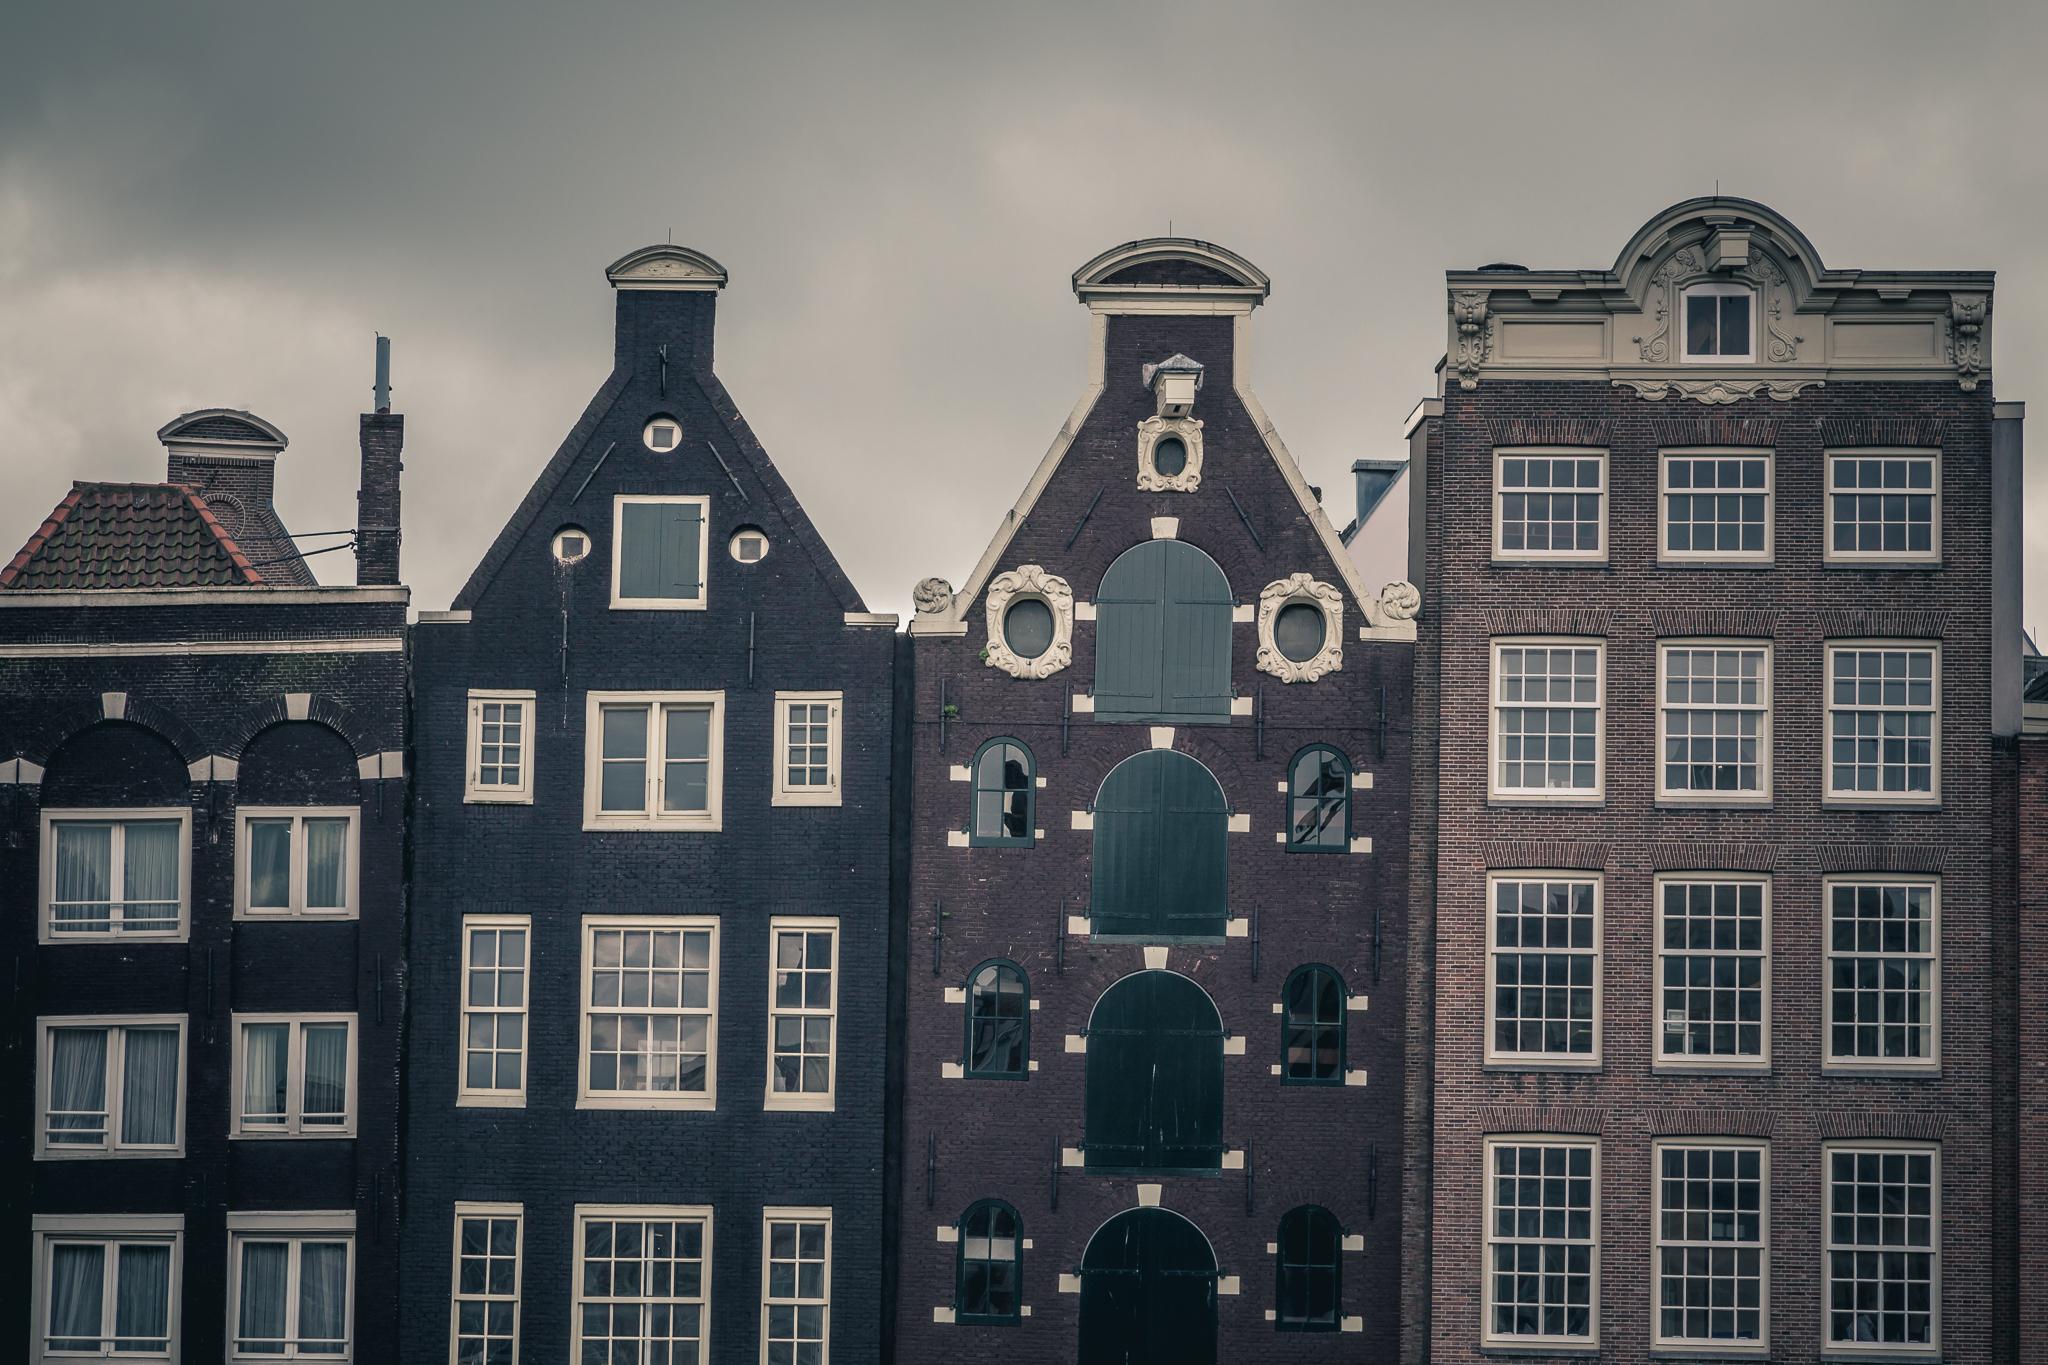 Amsterdam_2048-0001.jpg